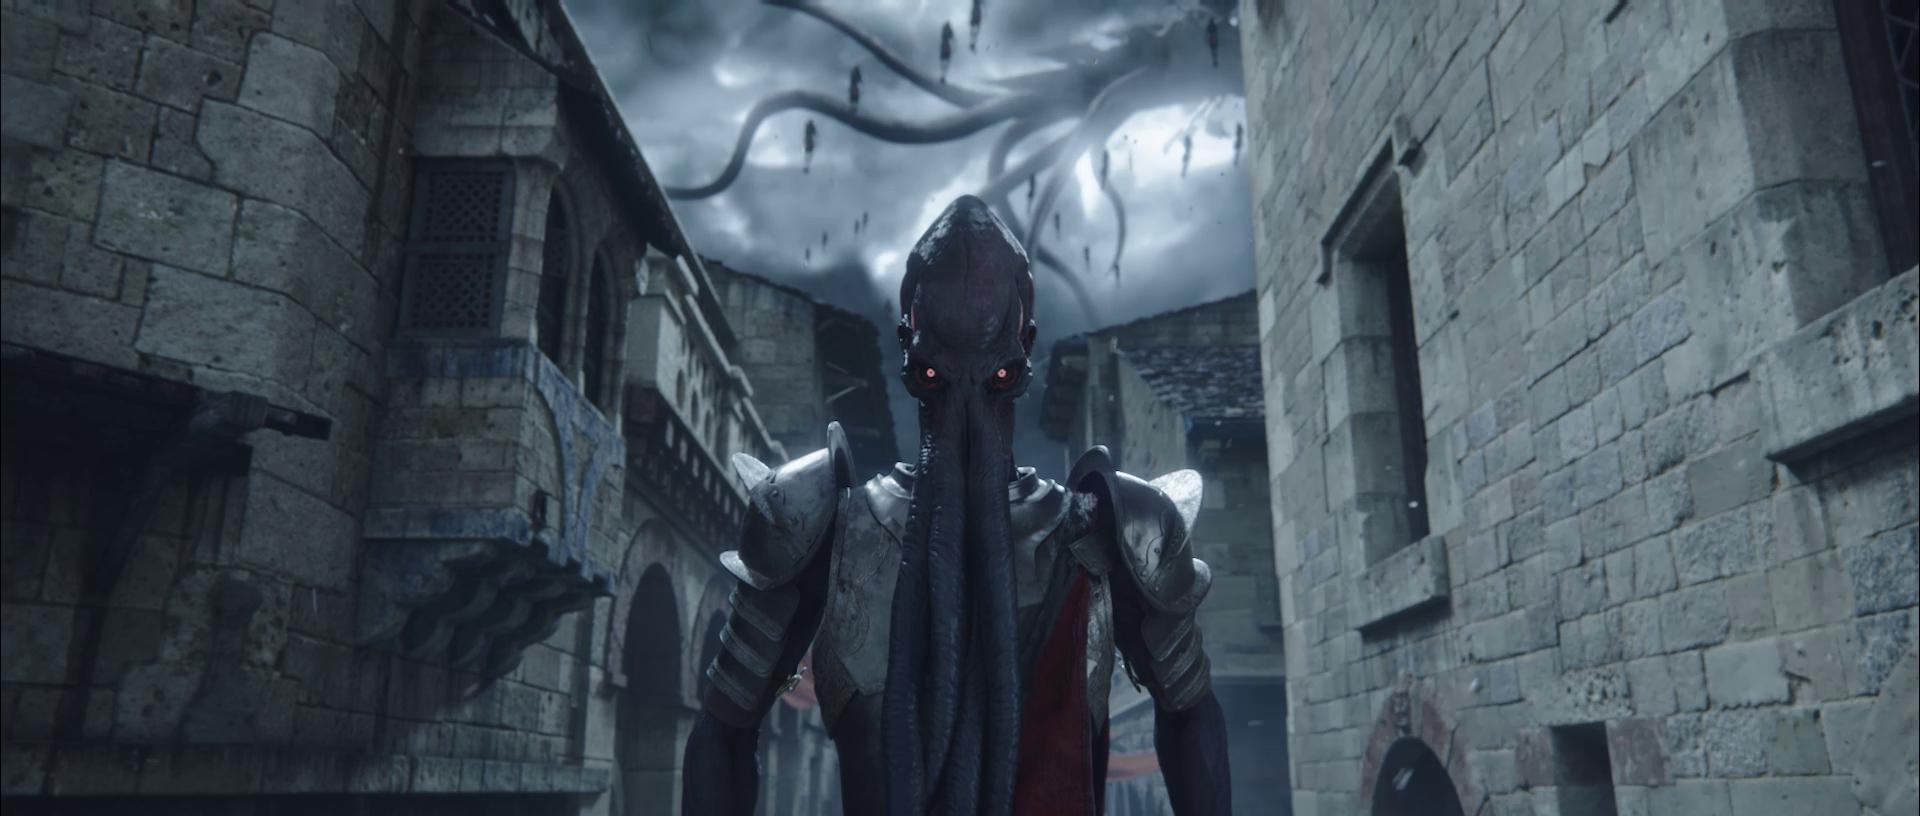 Baldur's Gate 3 announced, from the creators of Divinity: Original Sin